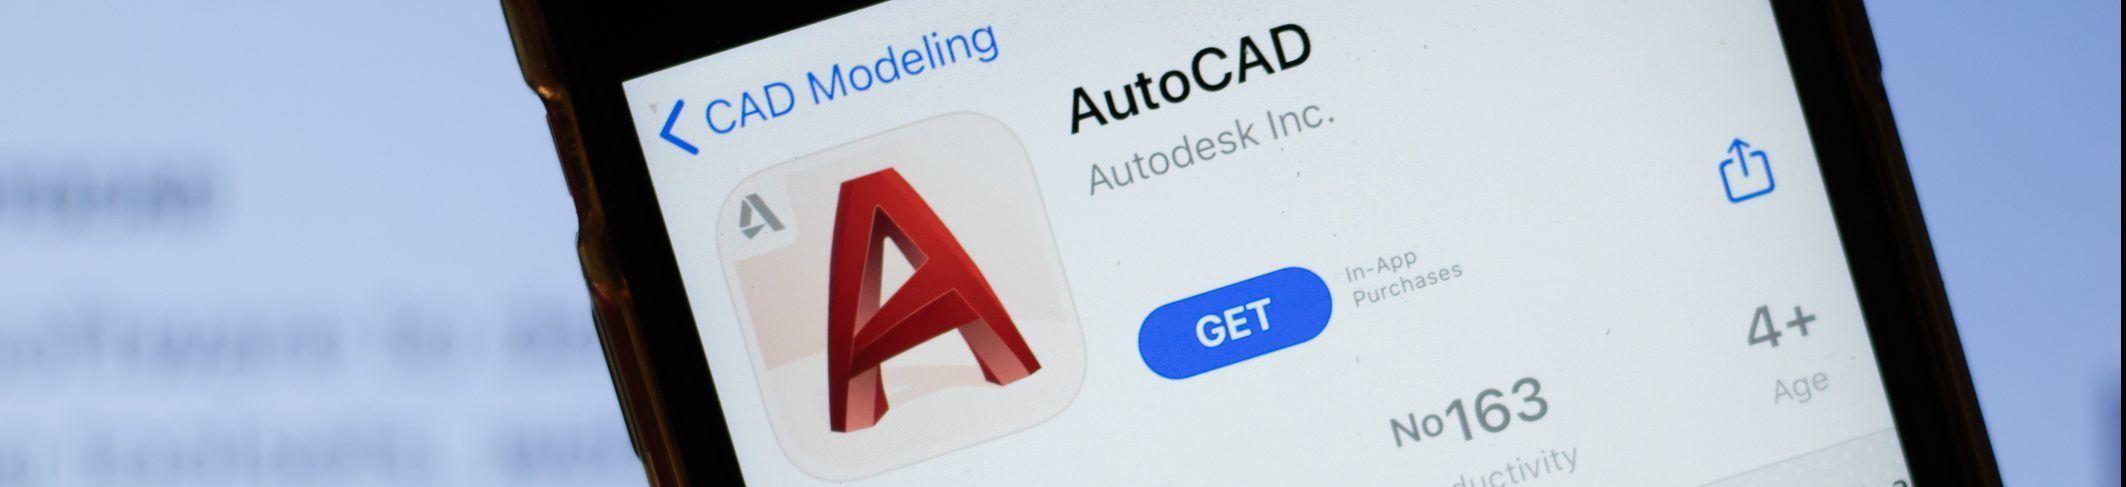 Autocad Revit architecture training